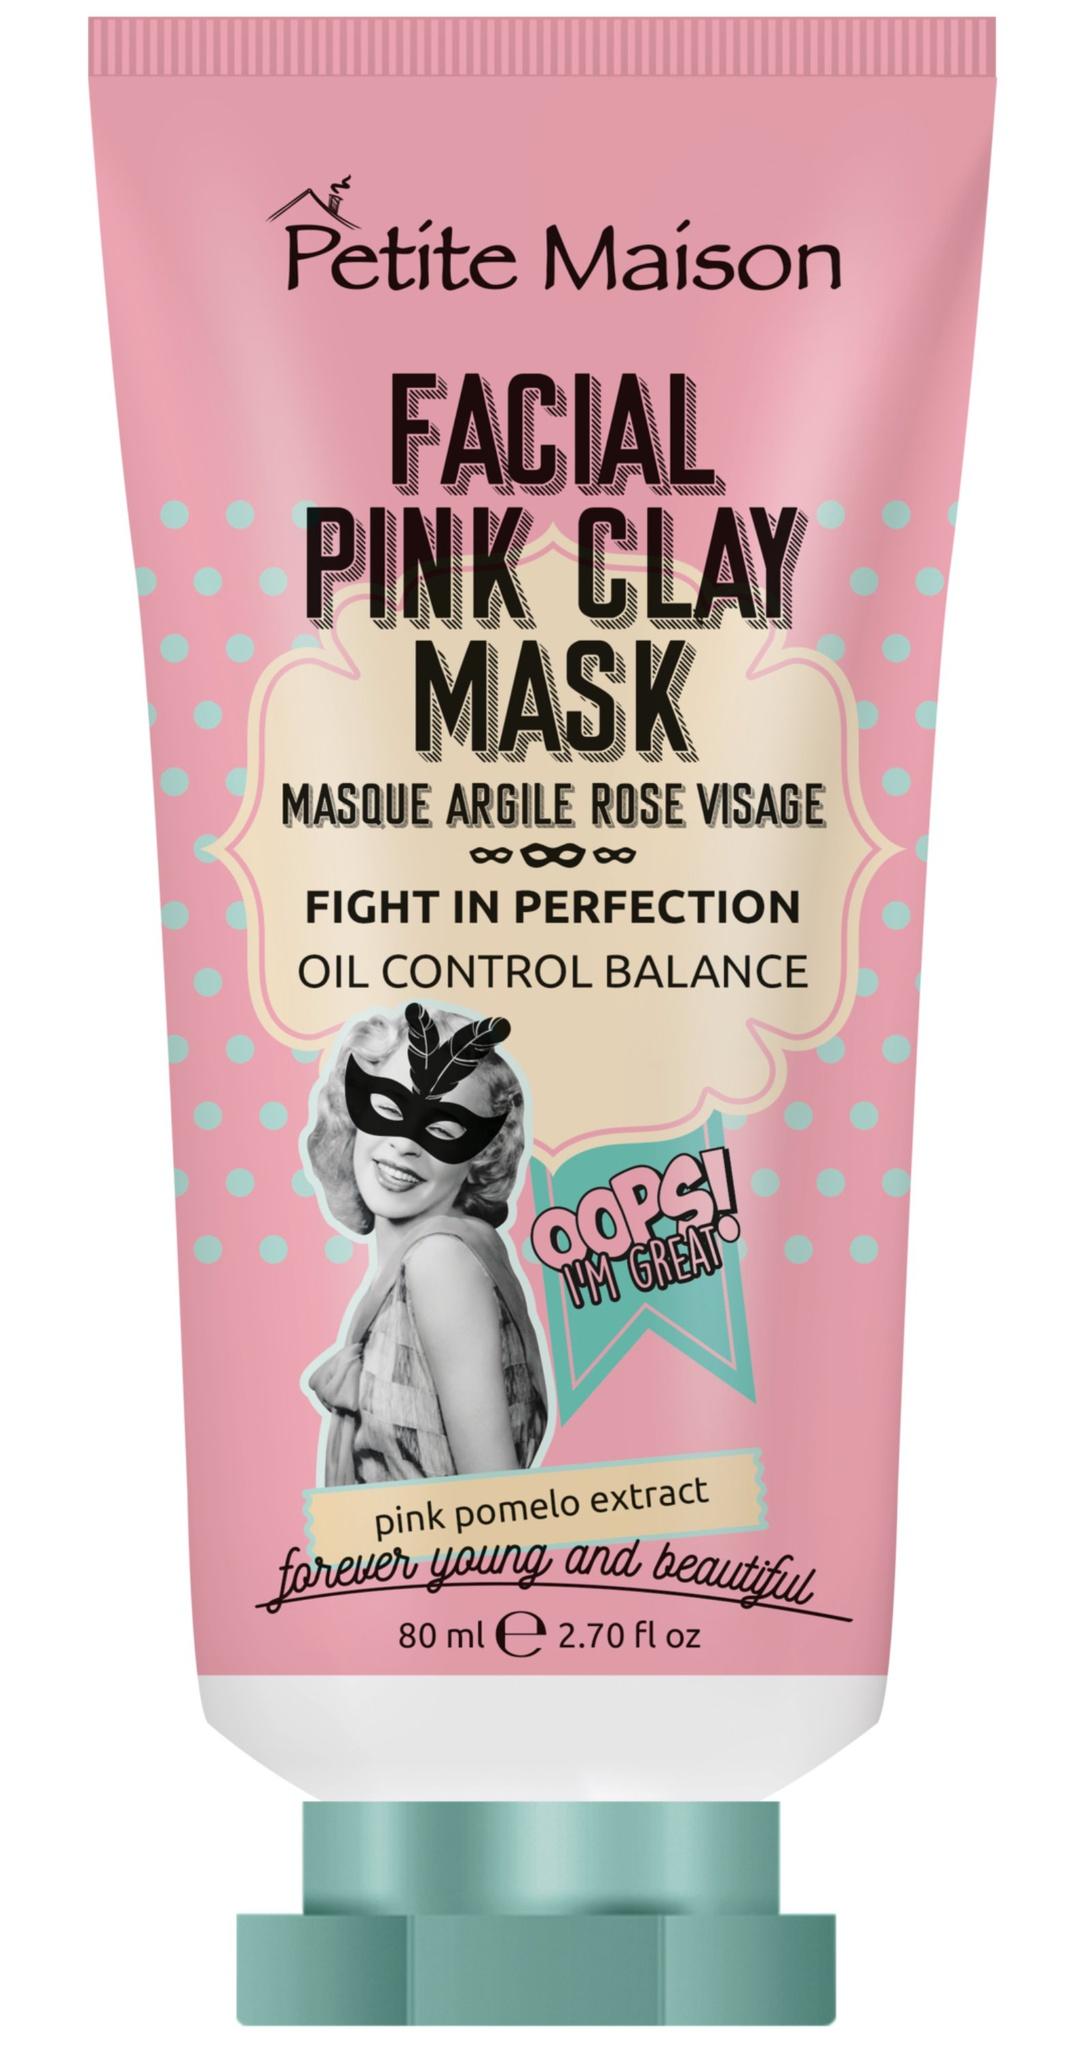 Petite Maison Facial Pink Clay Mask